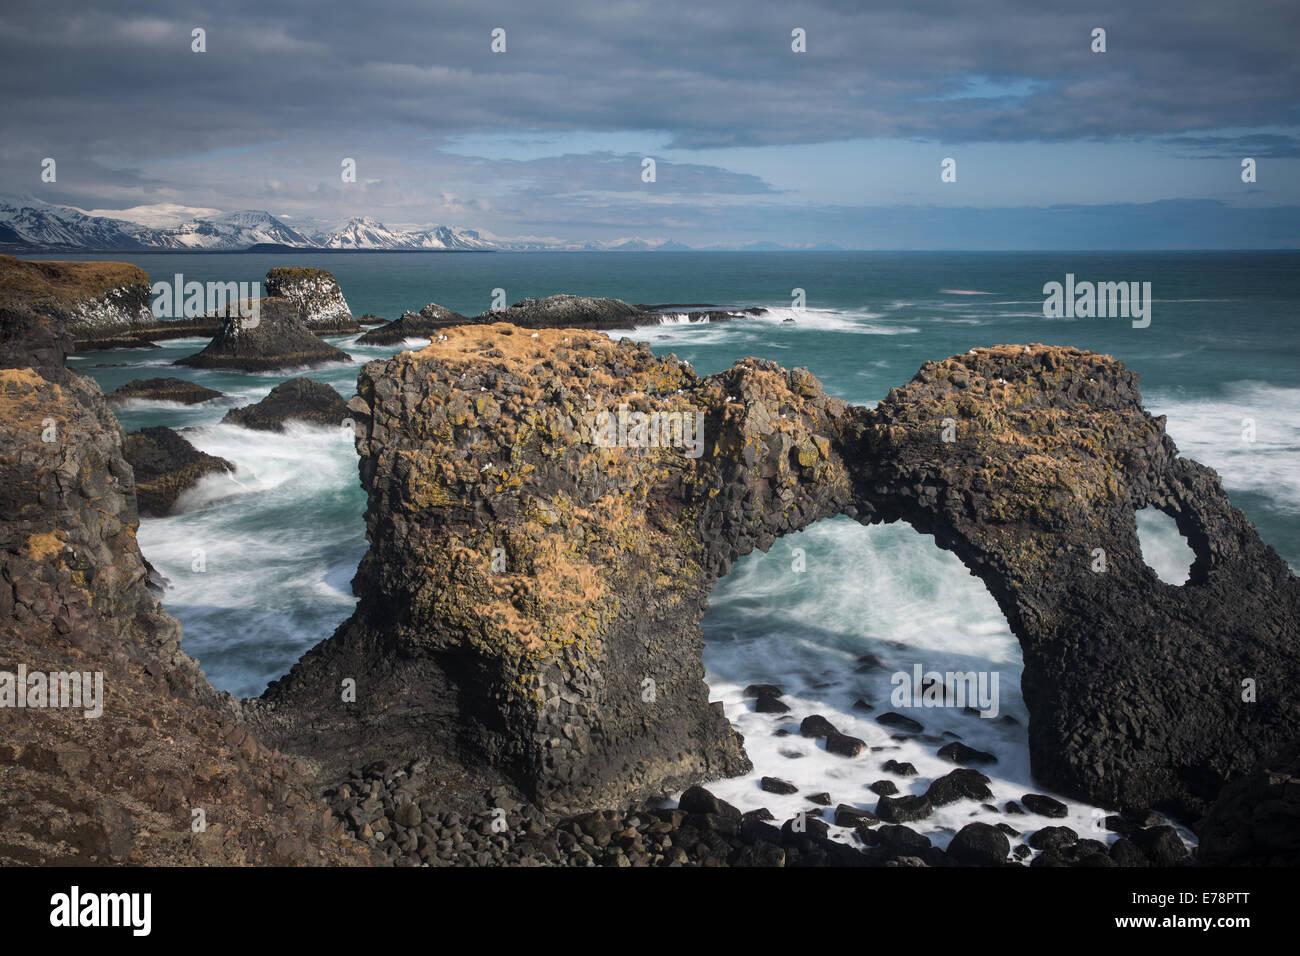 L'arch rock de Gatklettur sur la côte nr Arnastapi, Péninsule de Snæfellsnes, l'ouest de Photo Stock